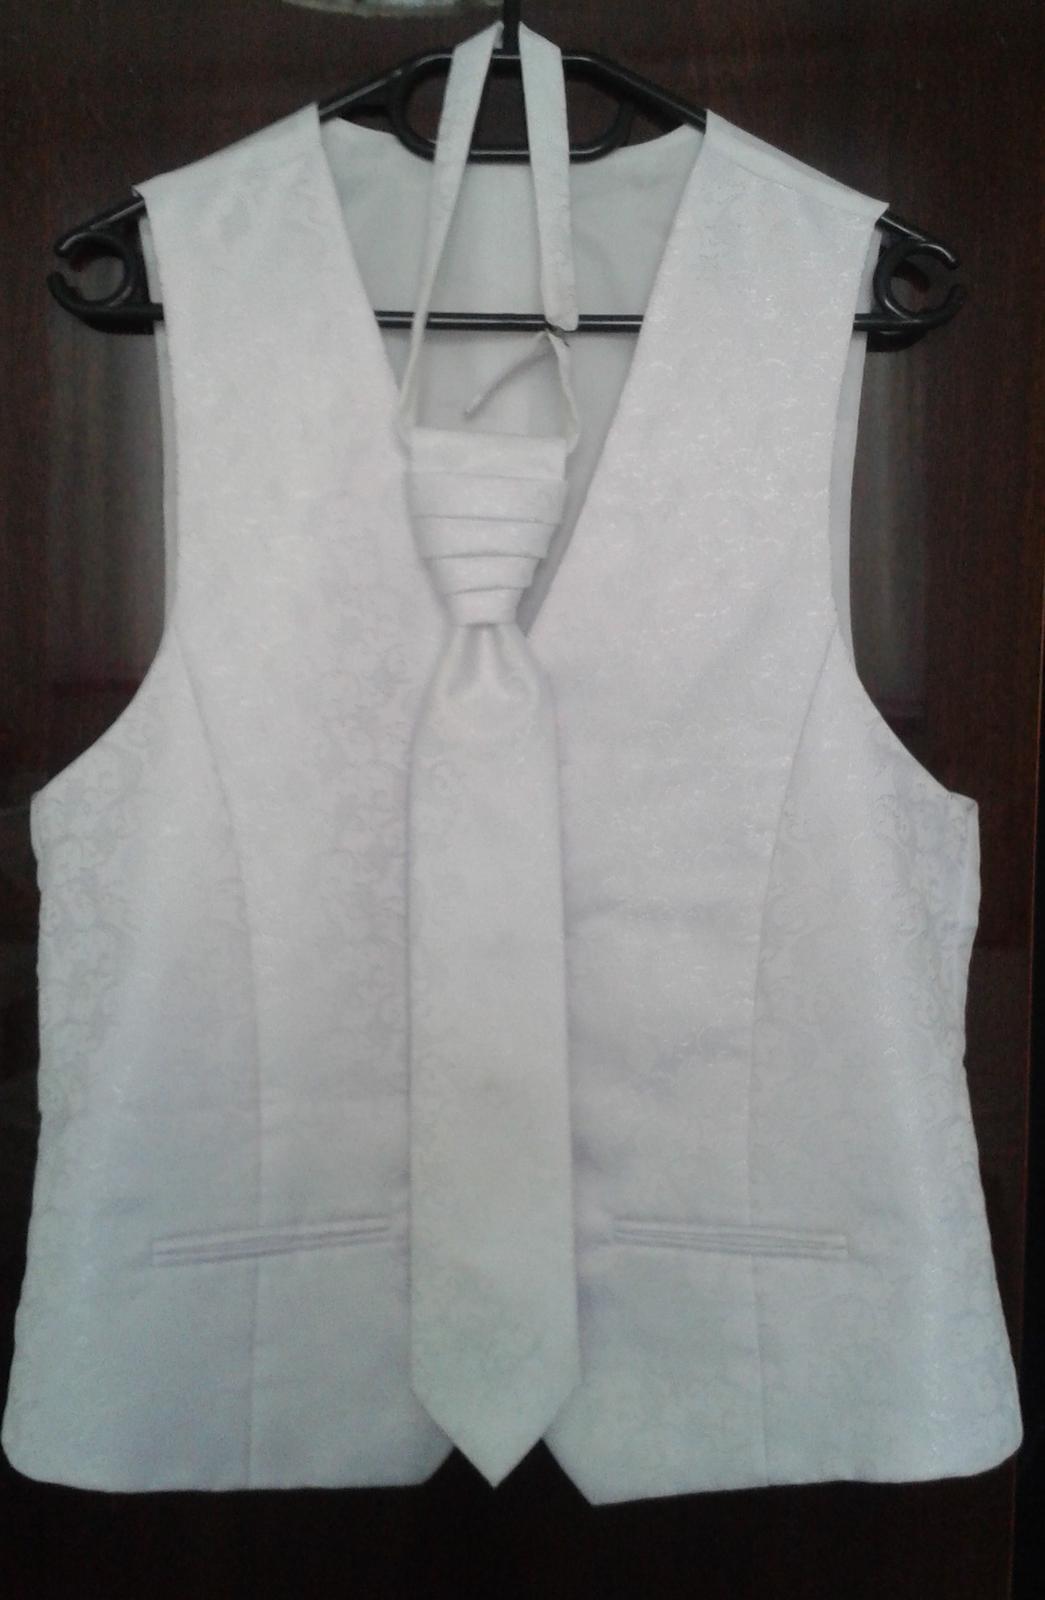 Svadobná vesta+kravata+vreckovka - Obrázok č. 1